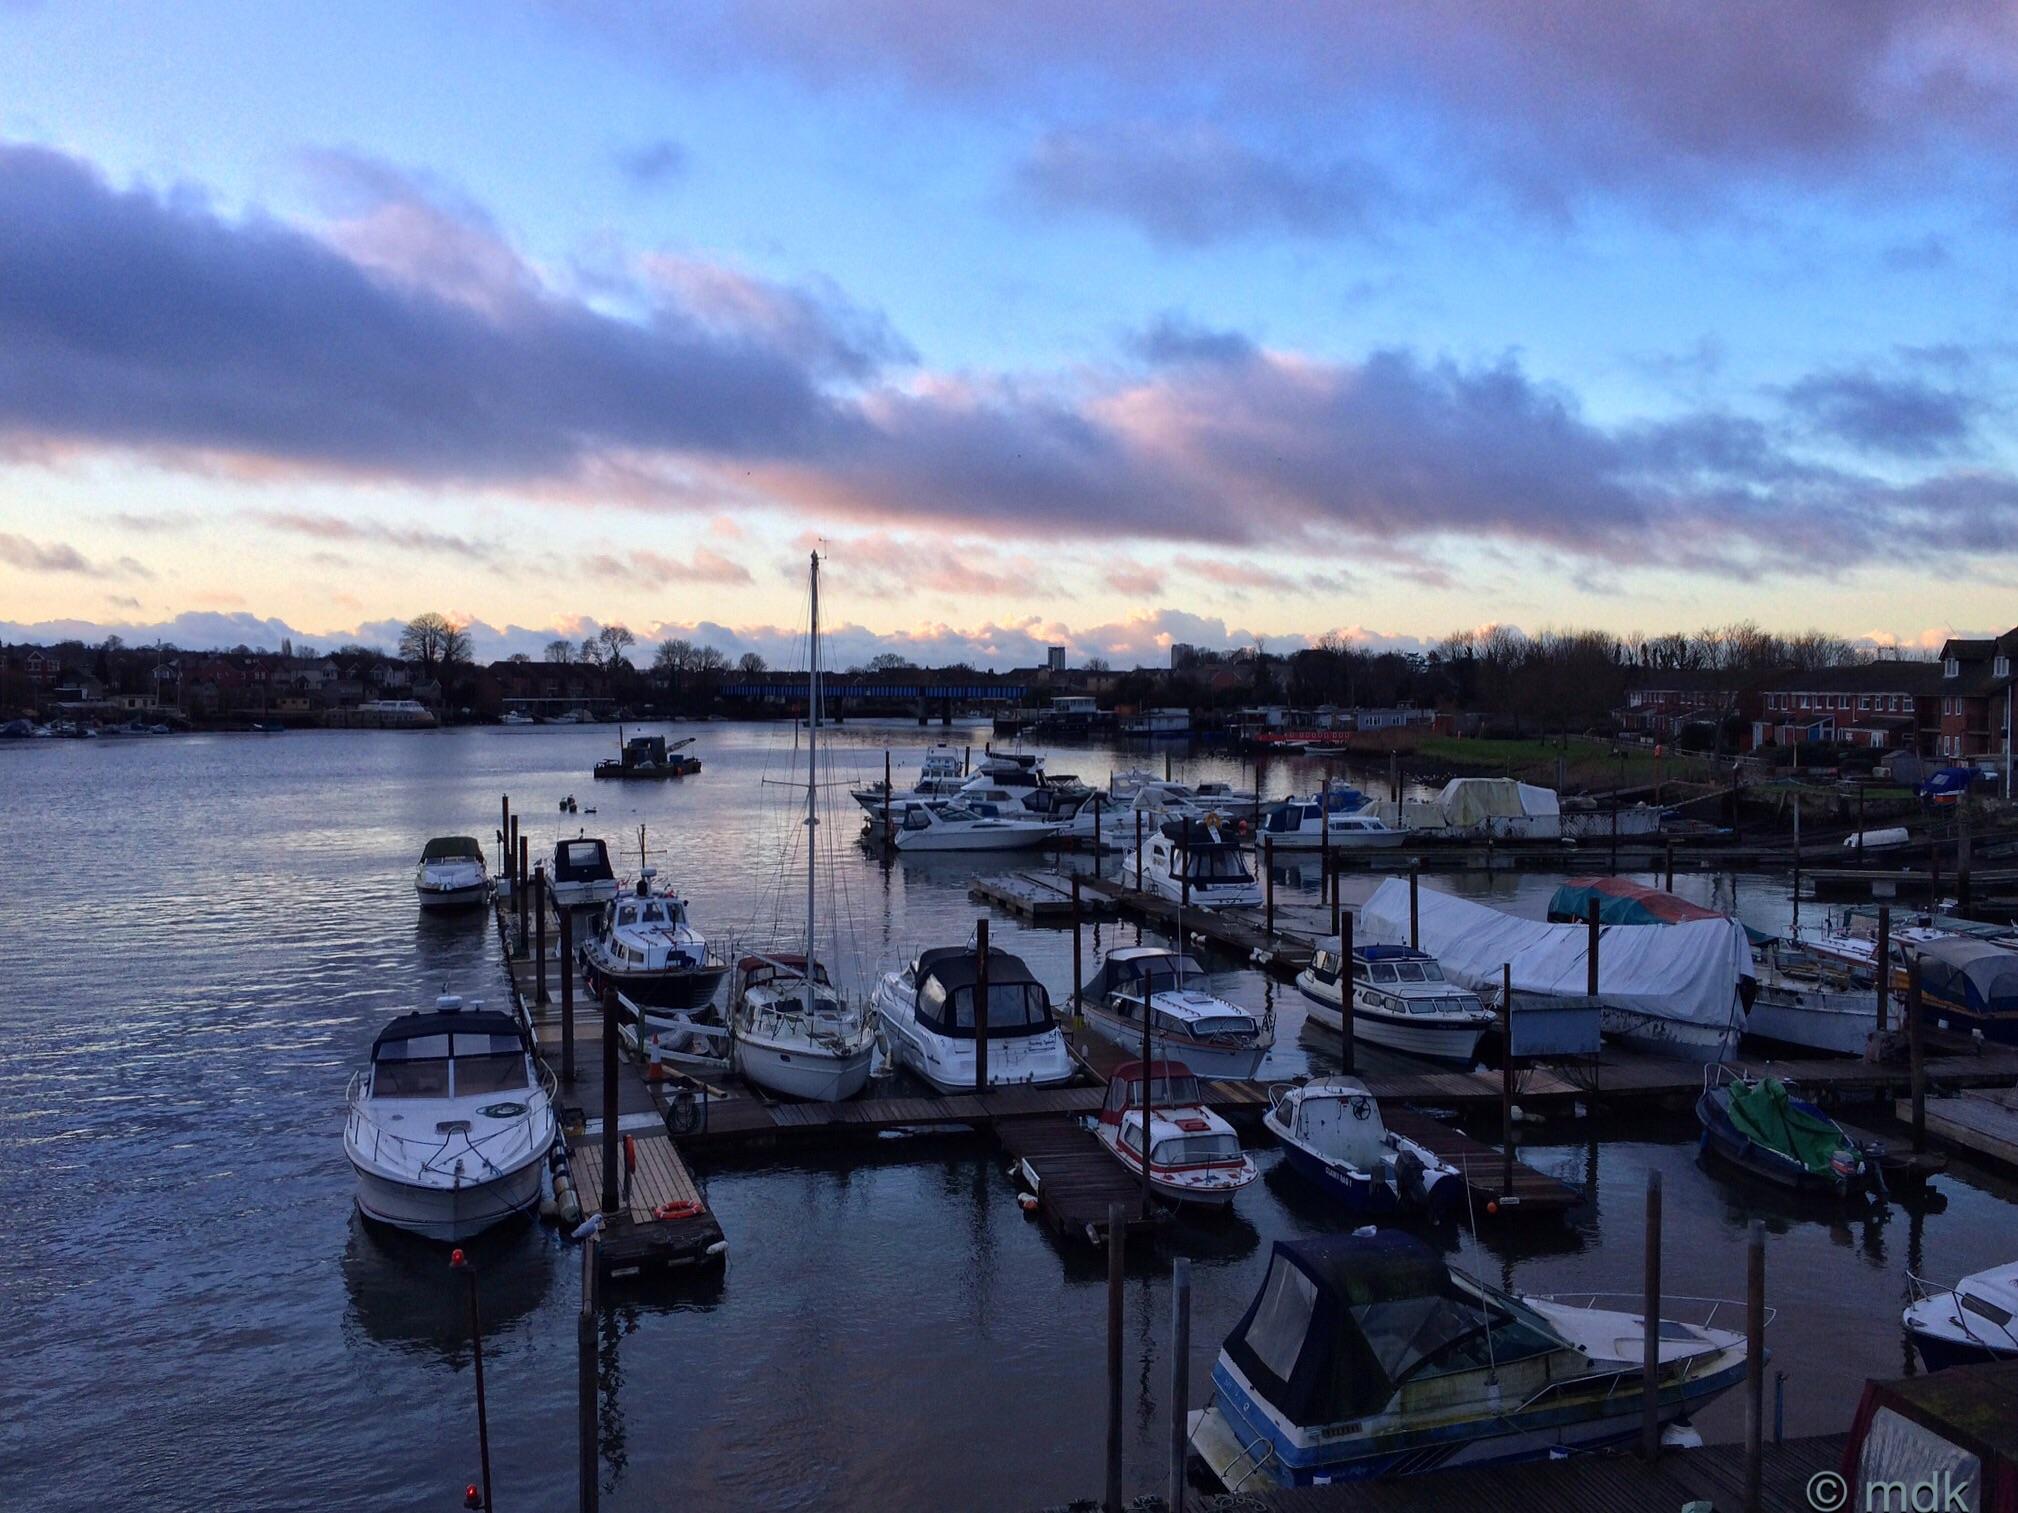 Wednesday morning on Cobden Bridge